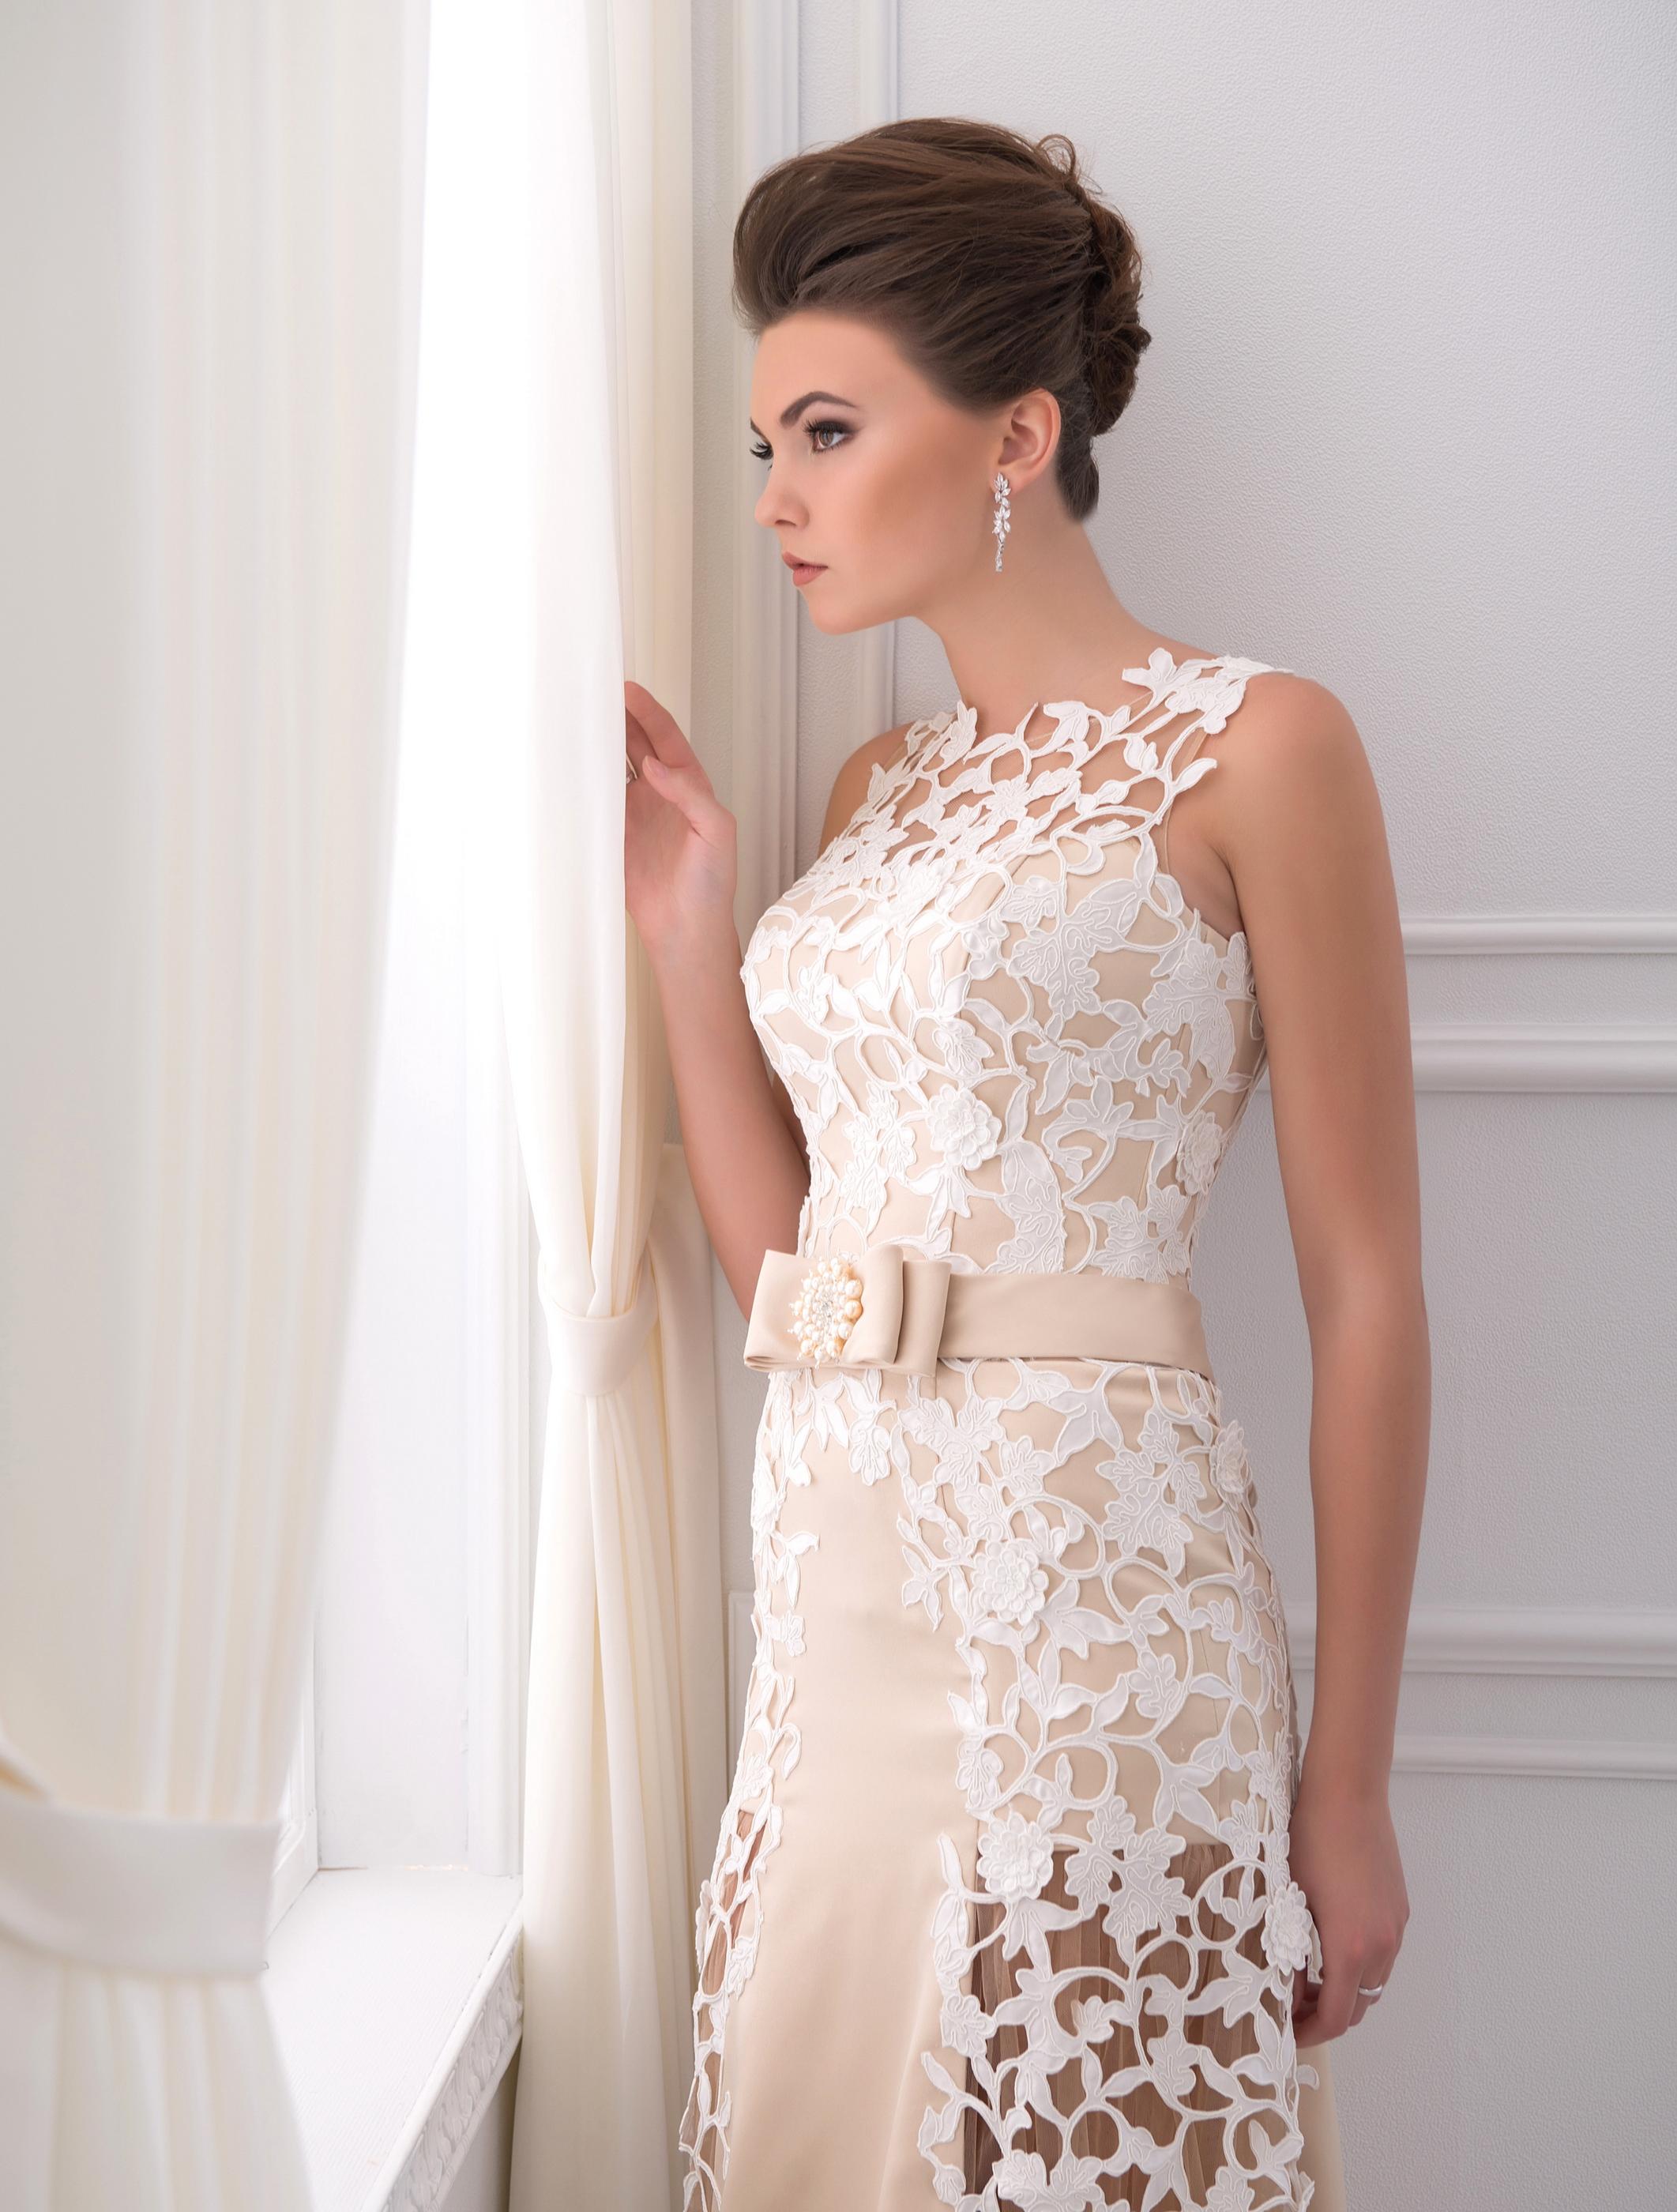 https://voloca-wedding-dresses.com/images/stories/virtuemart/product/VWD_EZ_13_a29.jpg